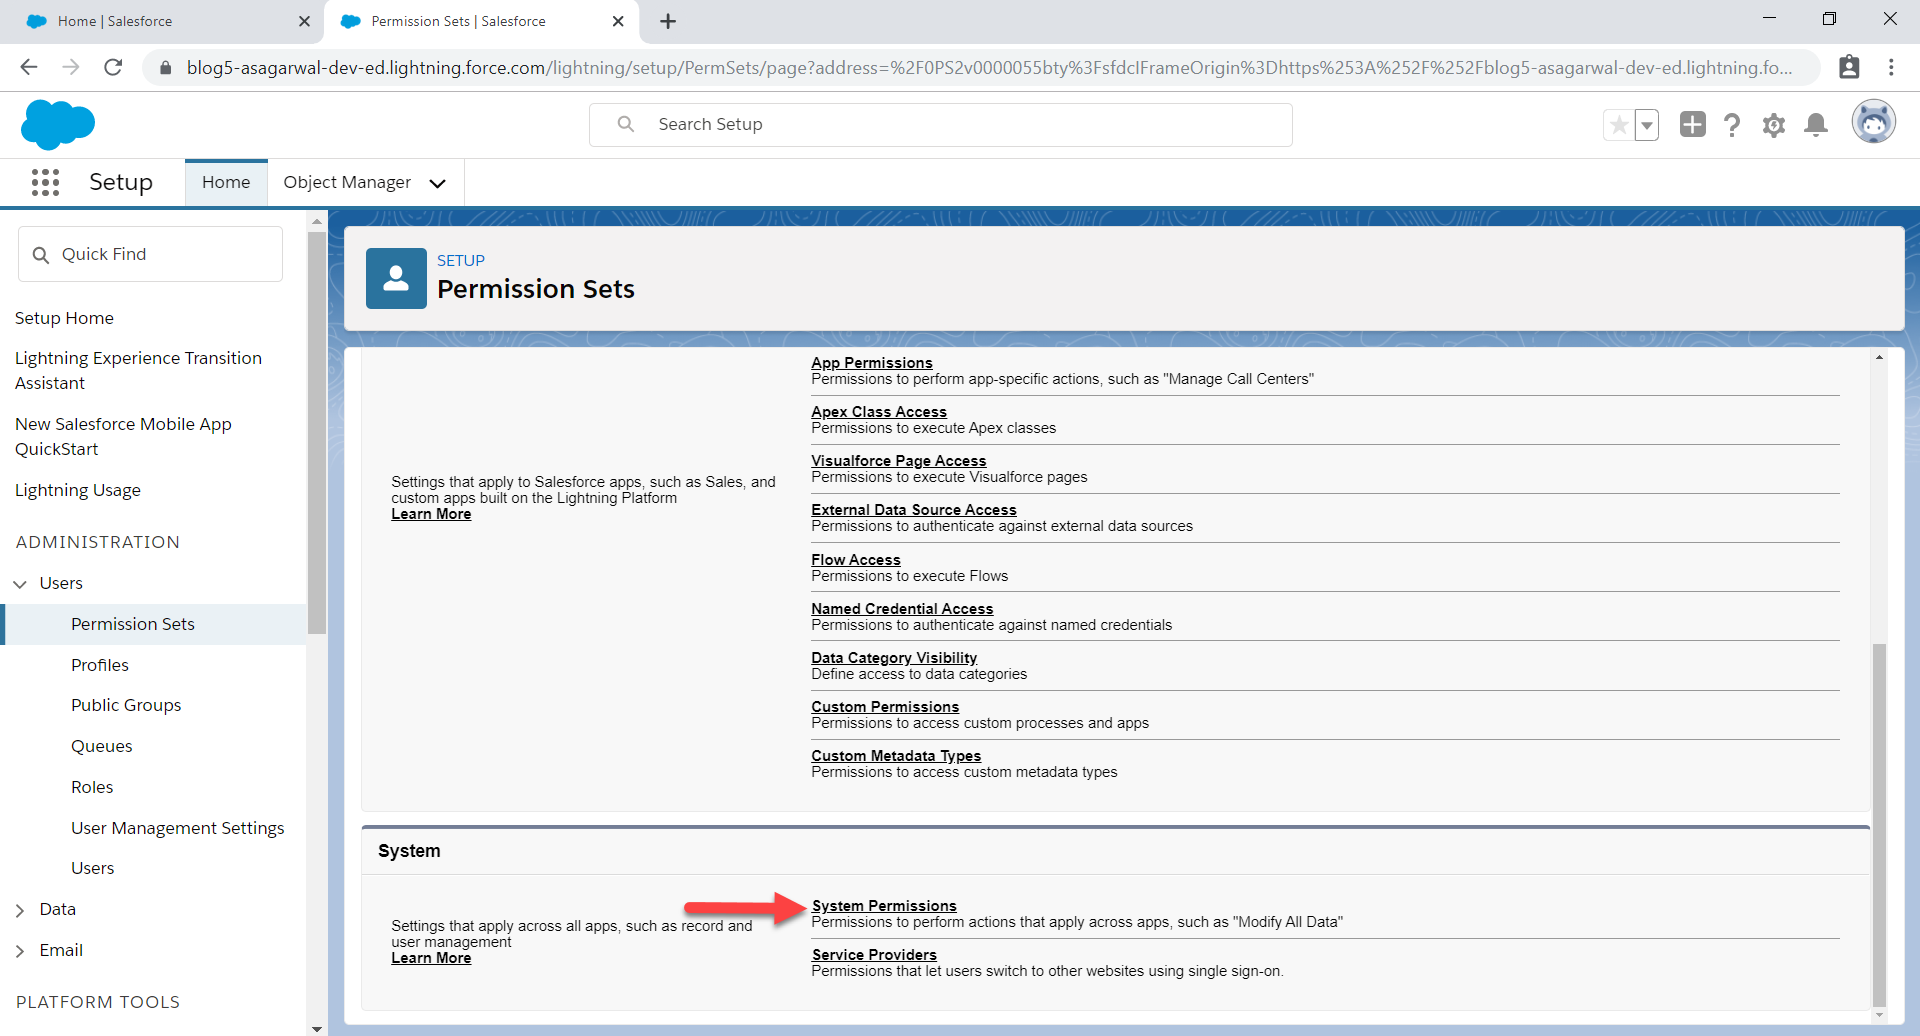 click system permissions